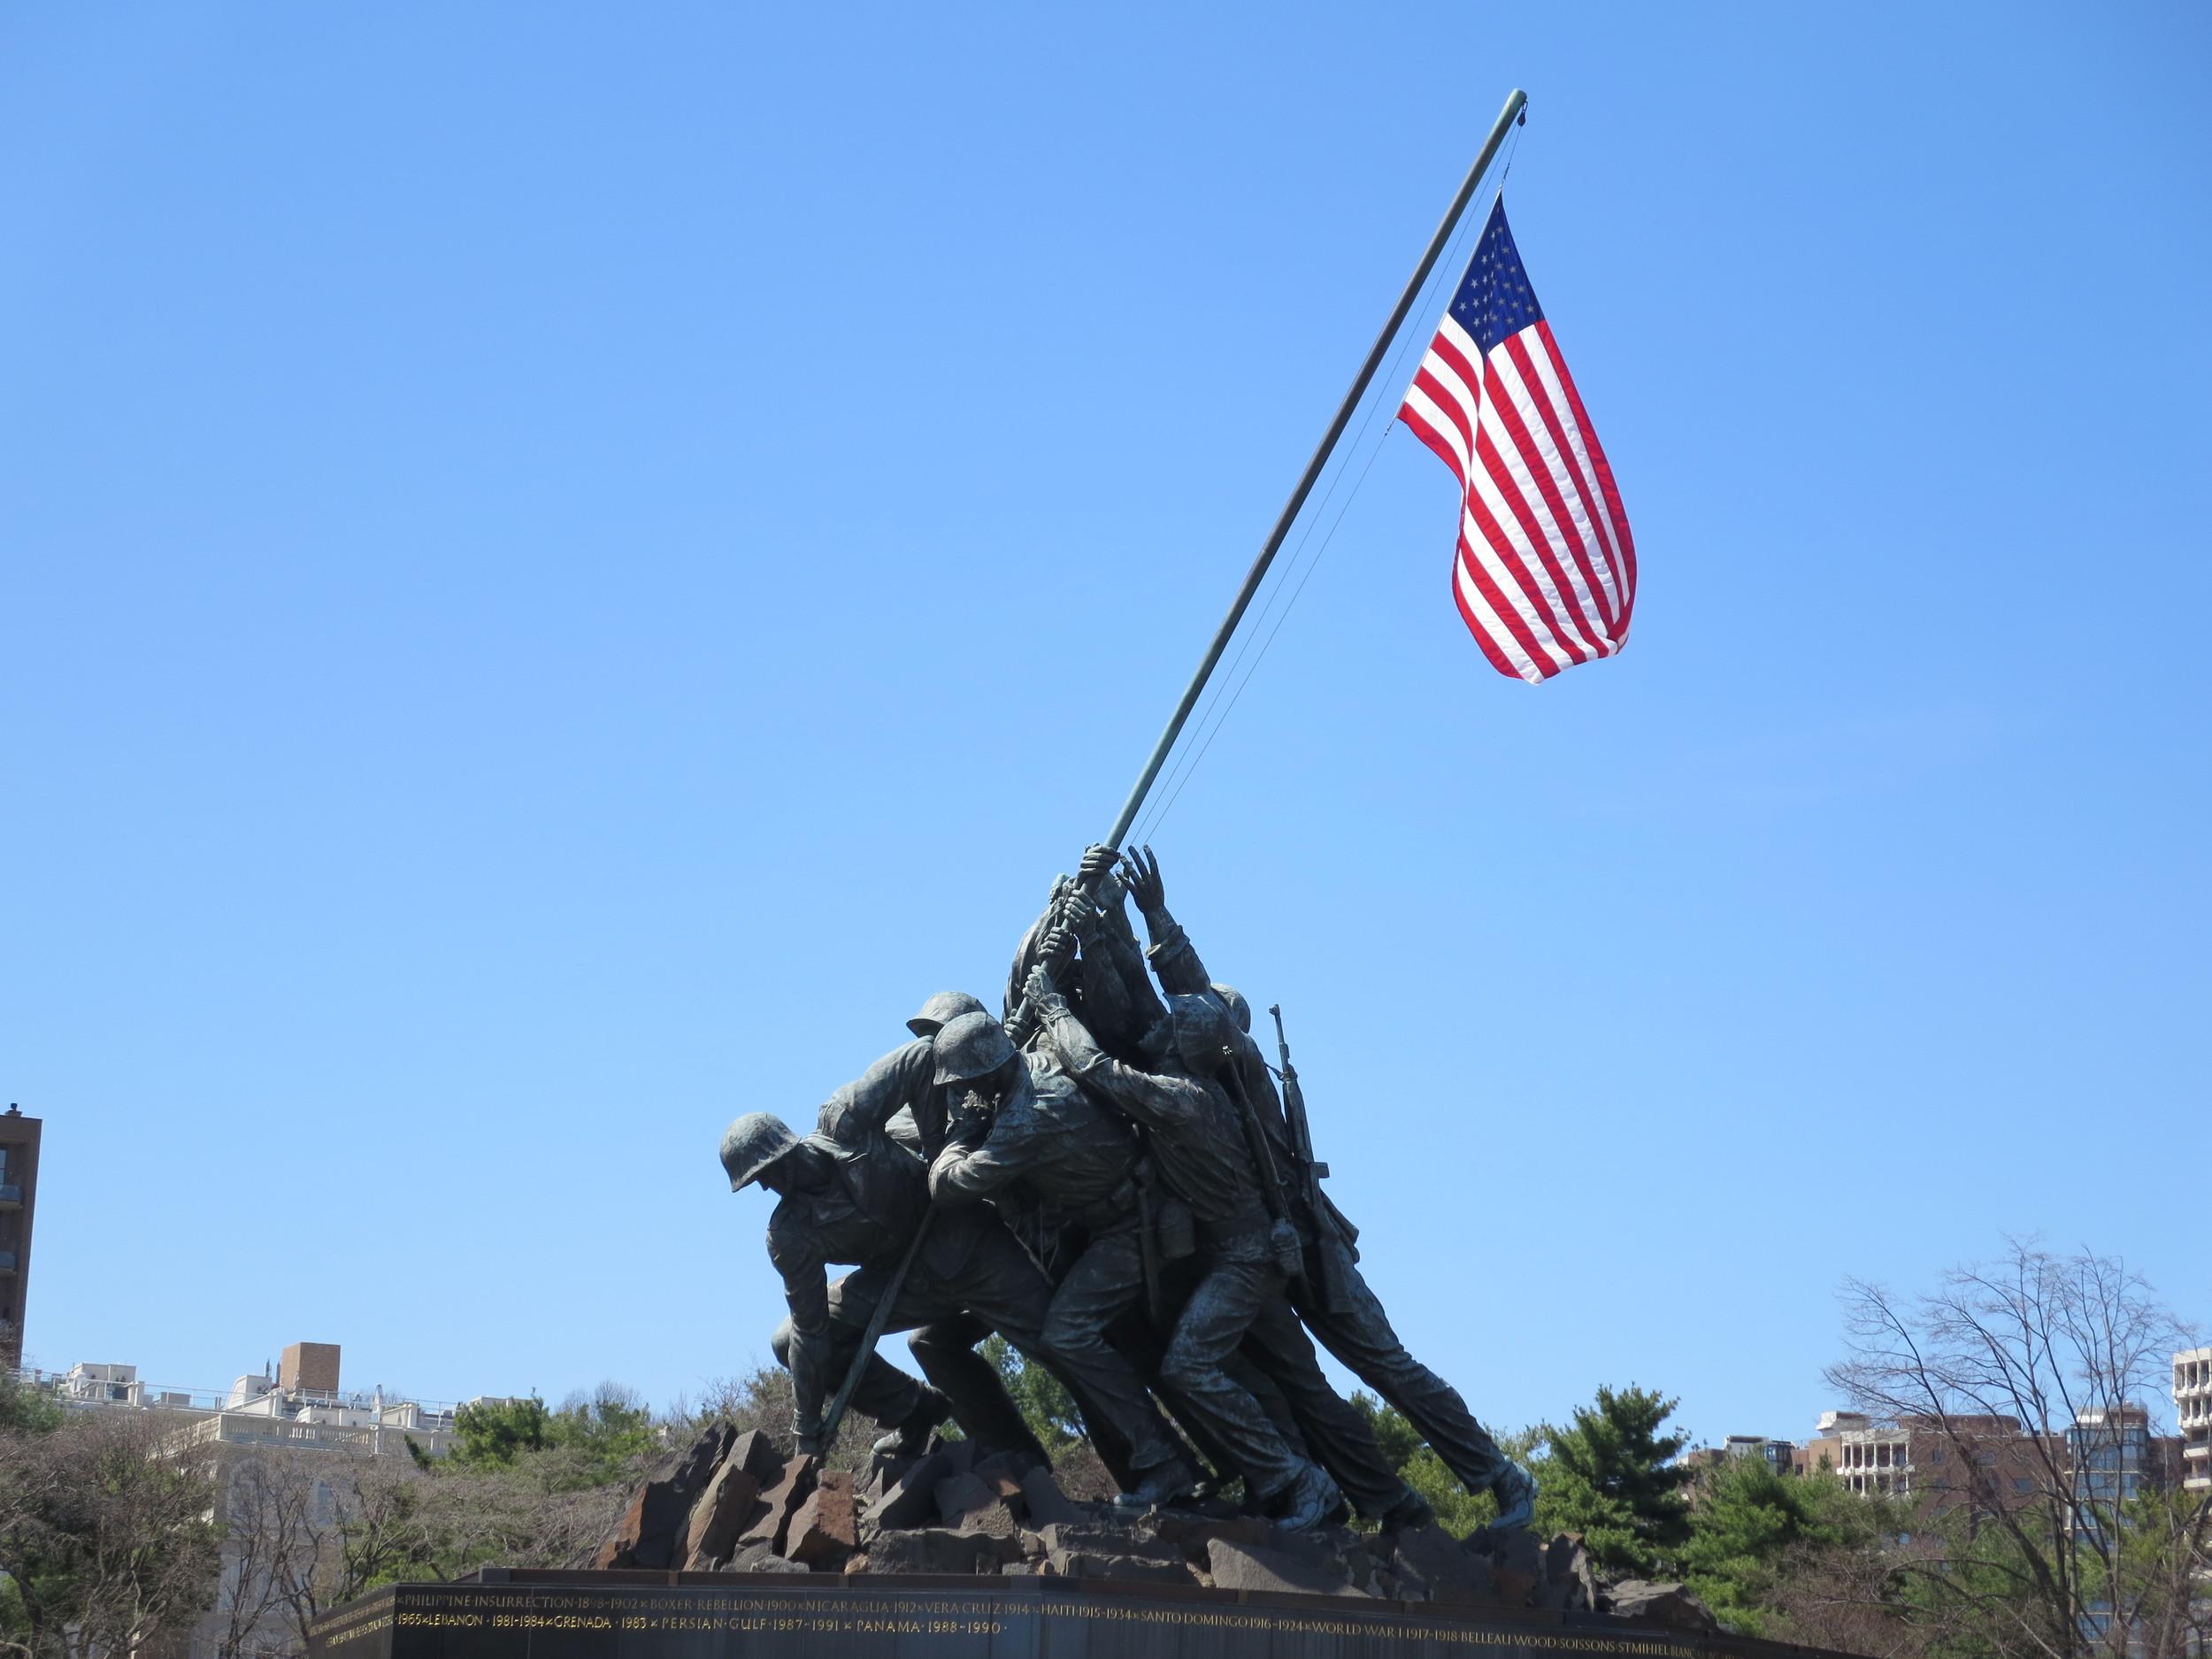 Iwo Jima Memorial - much bigger than we had imagined